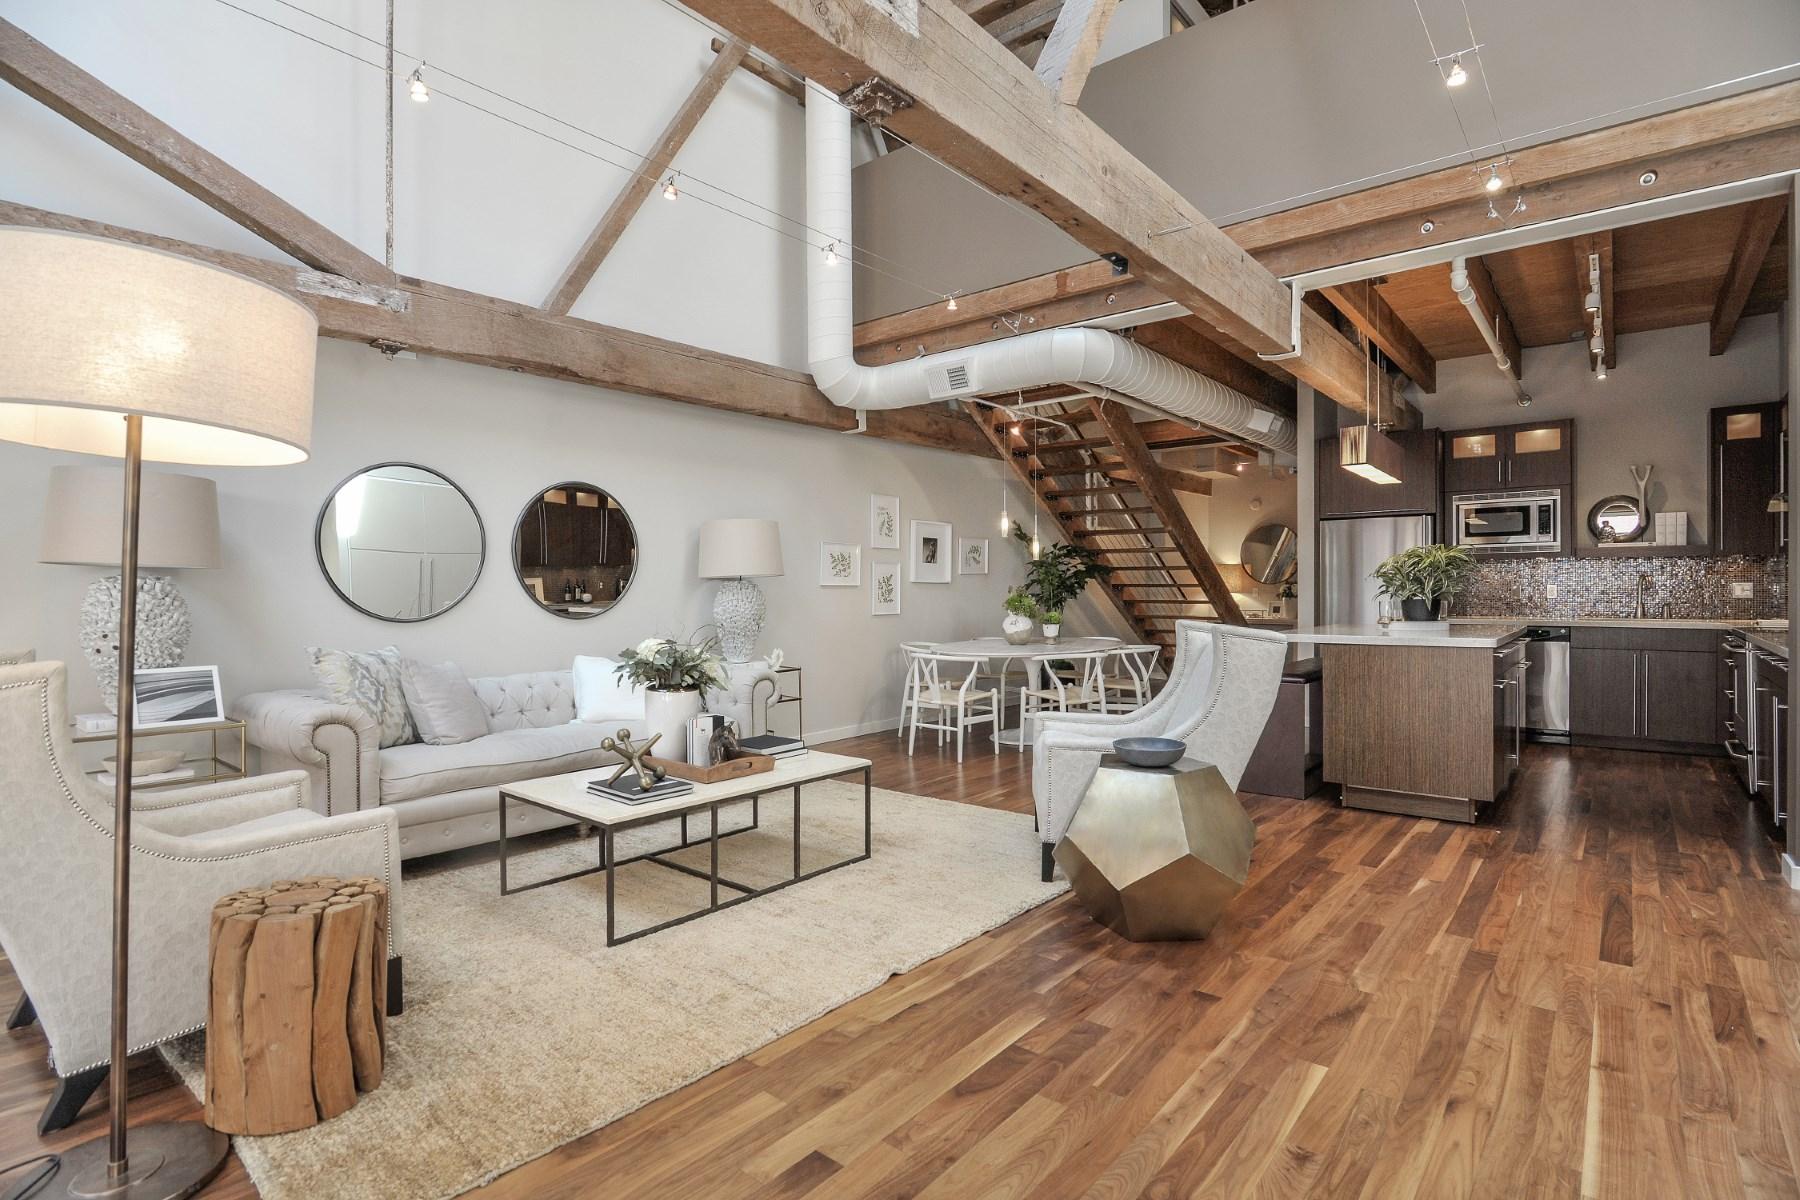 Condominium for Sale at Stunning Brick and Timber Loft 650 Delancey St Apt 311 South Beach, San Francisco, California, 94107 United States